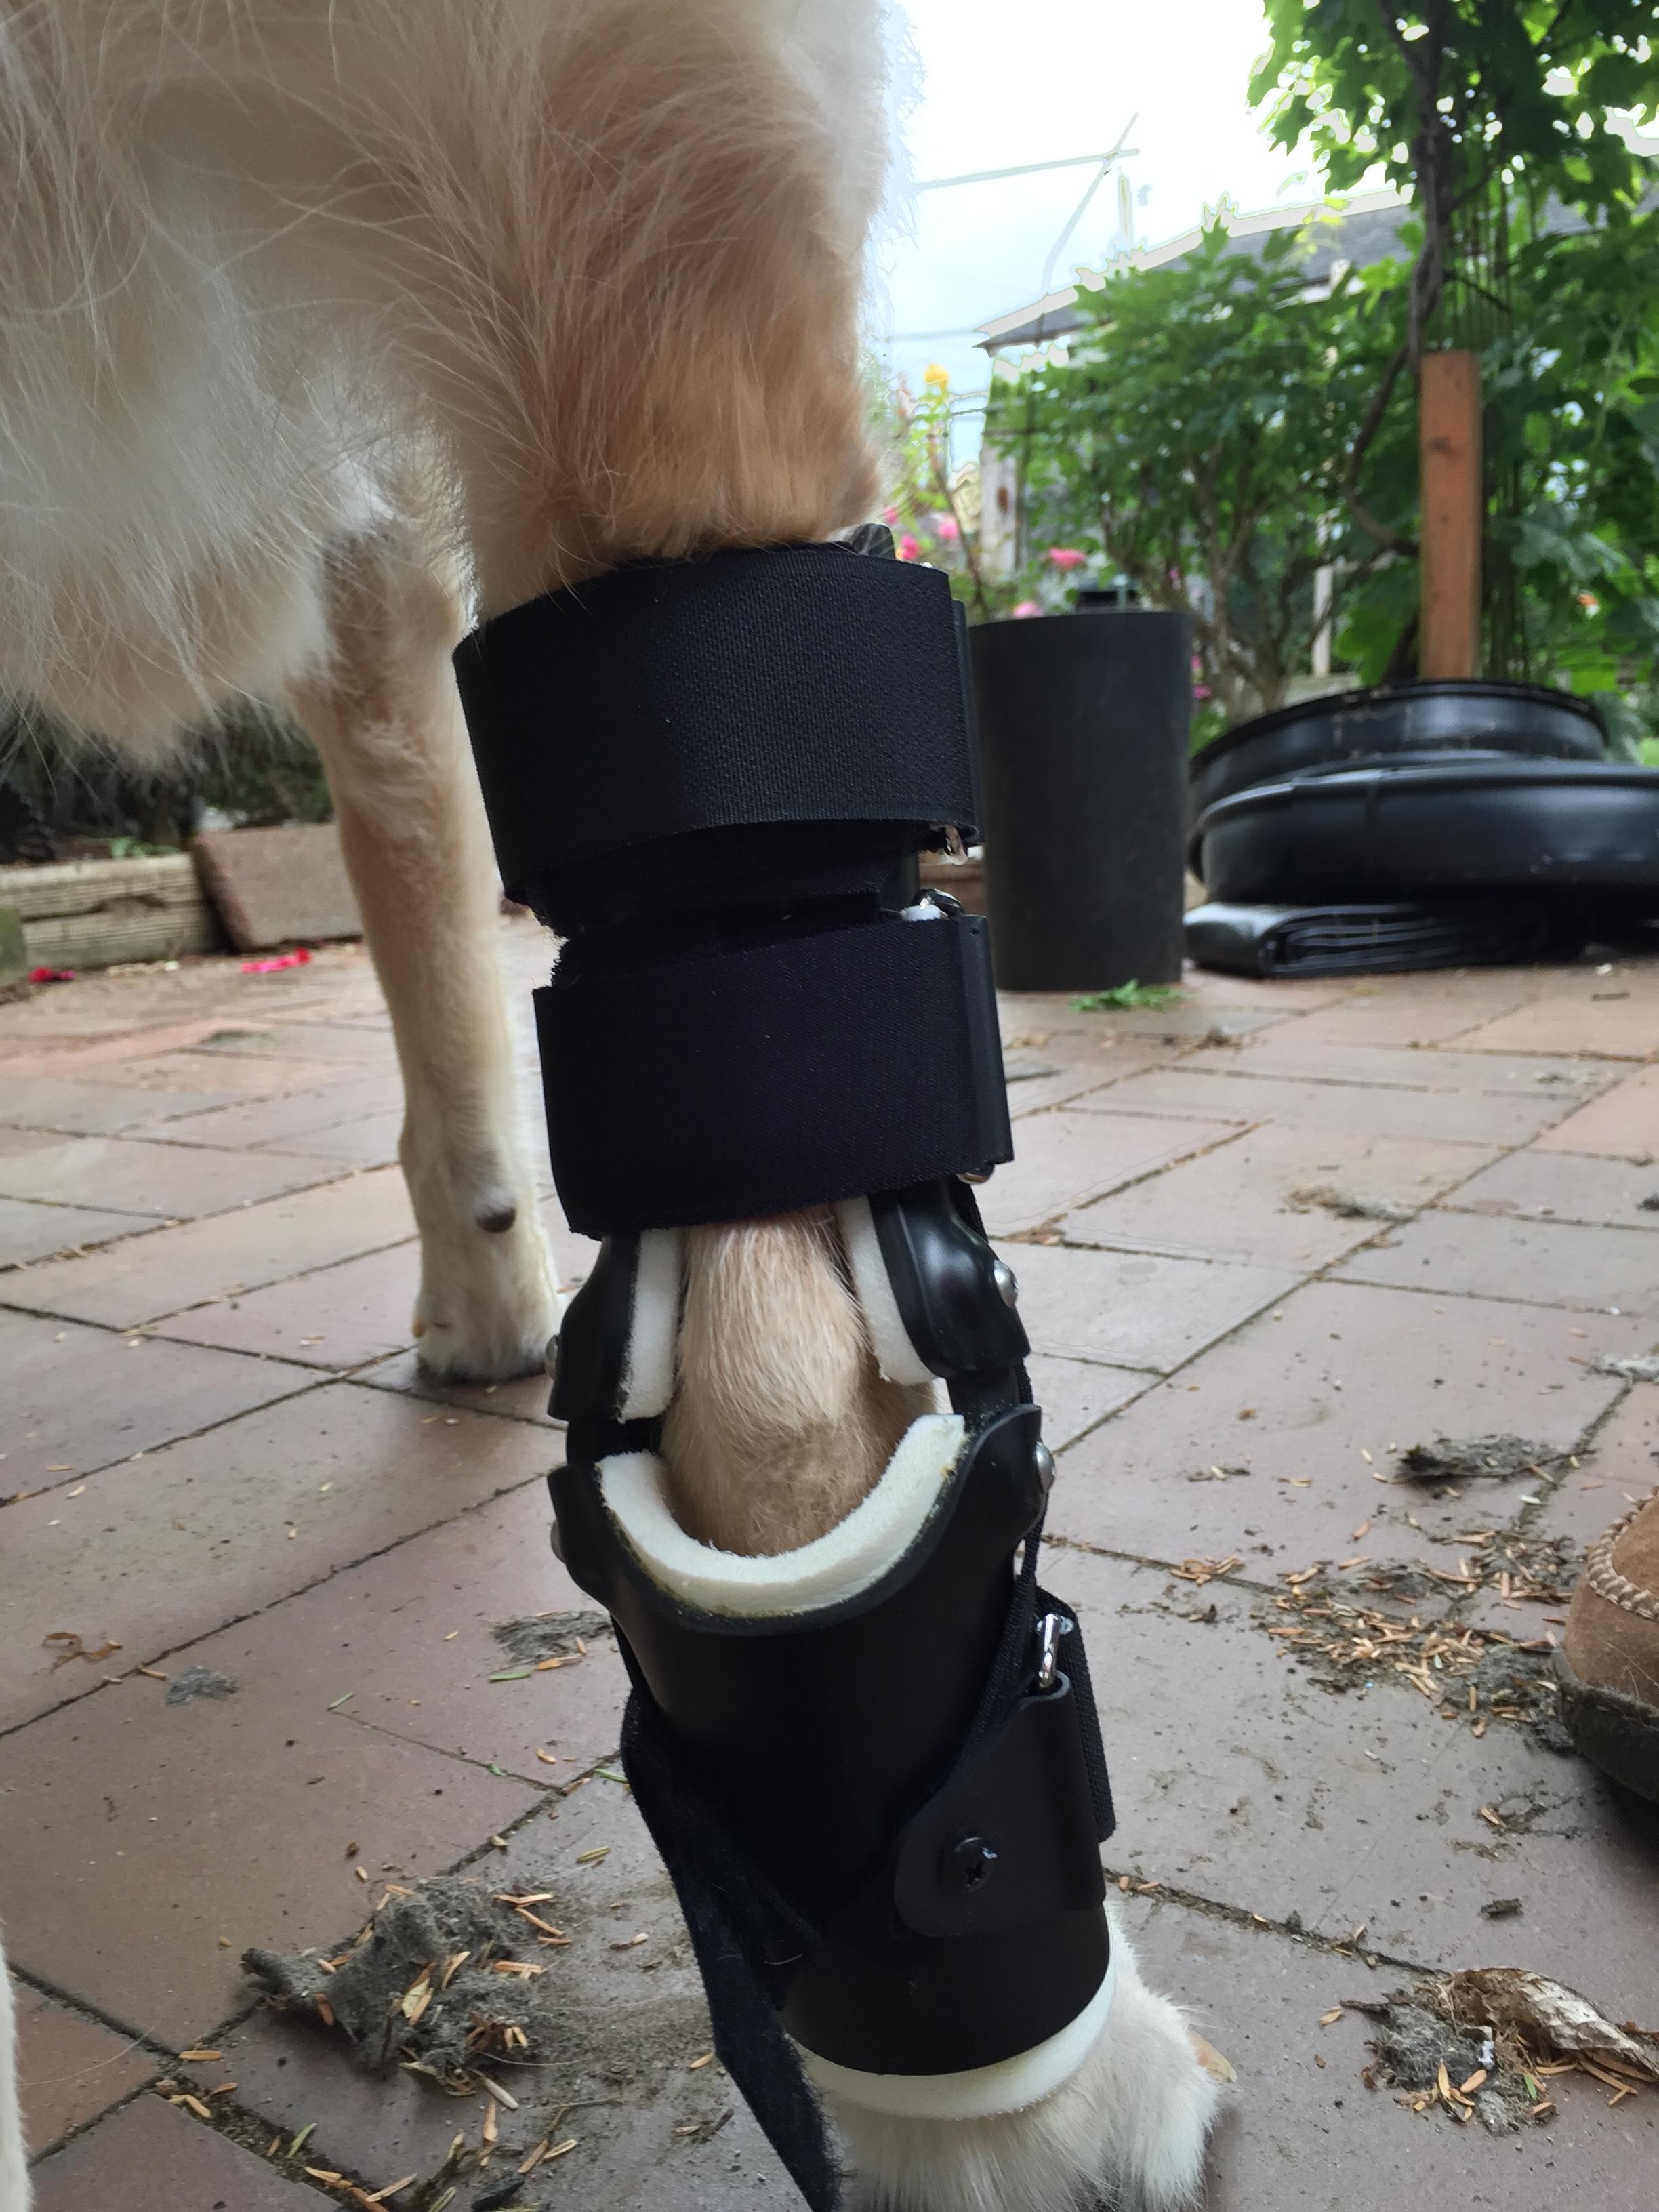 Canine Tarsal Hyperextension Brace